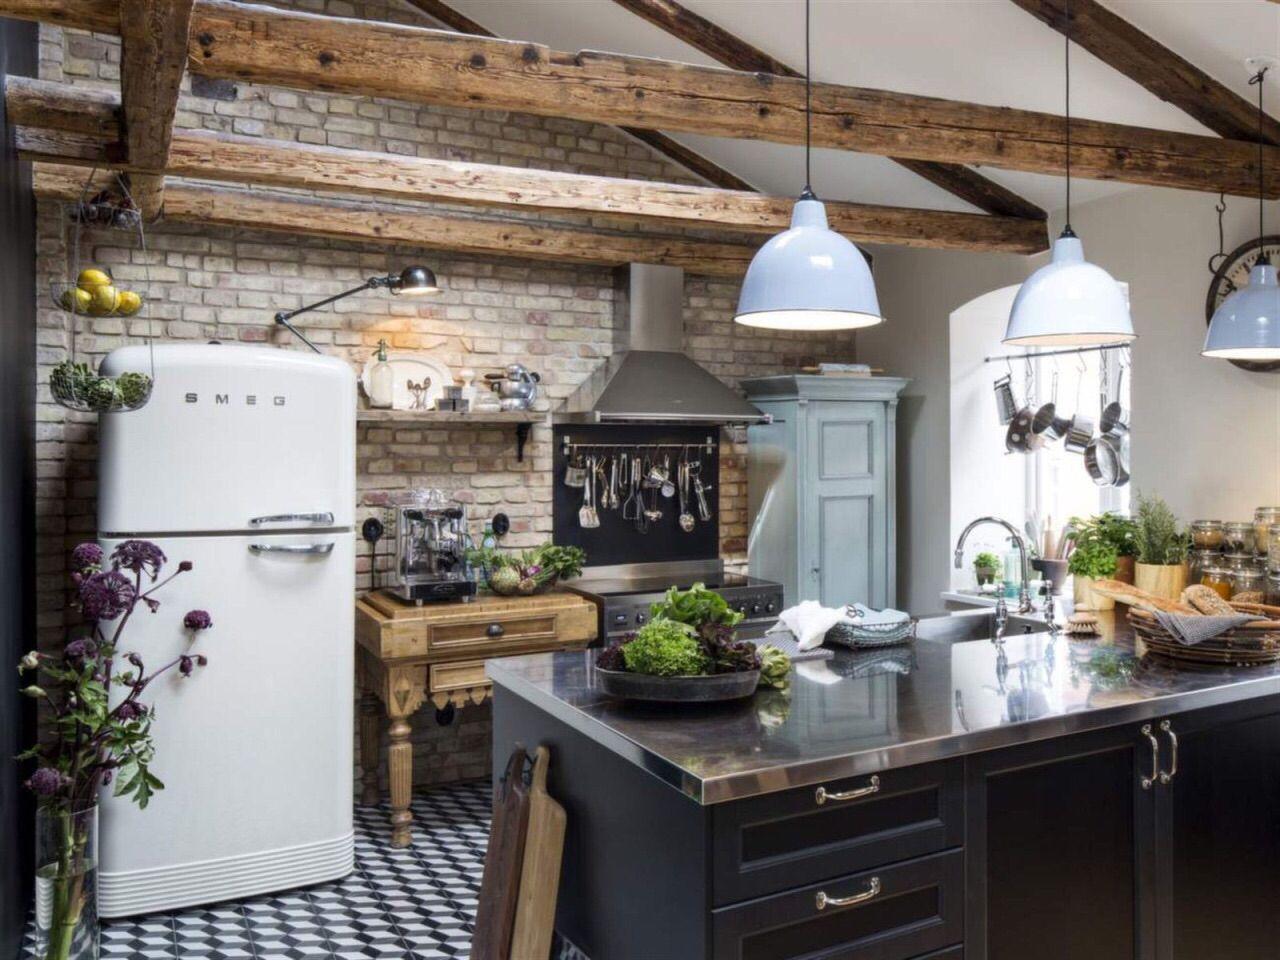 Inspiratie Smalle Keuken : Kitchen inspo houses keuken keukens en houten